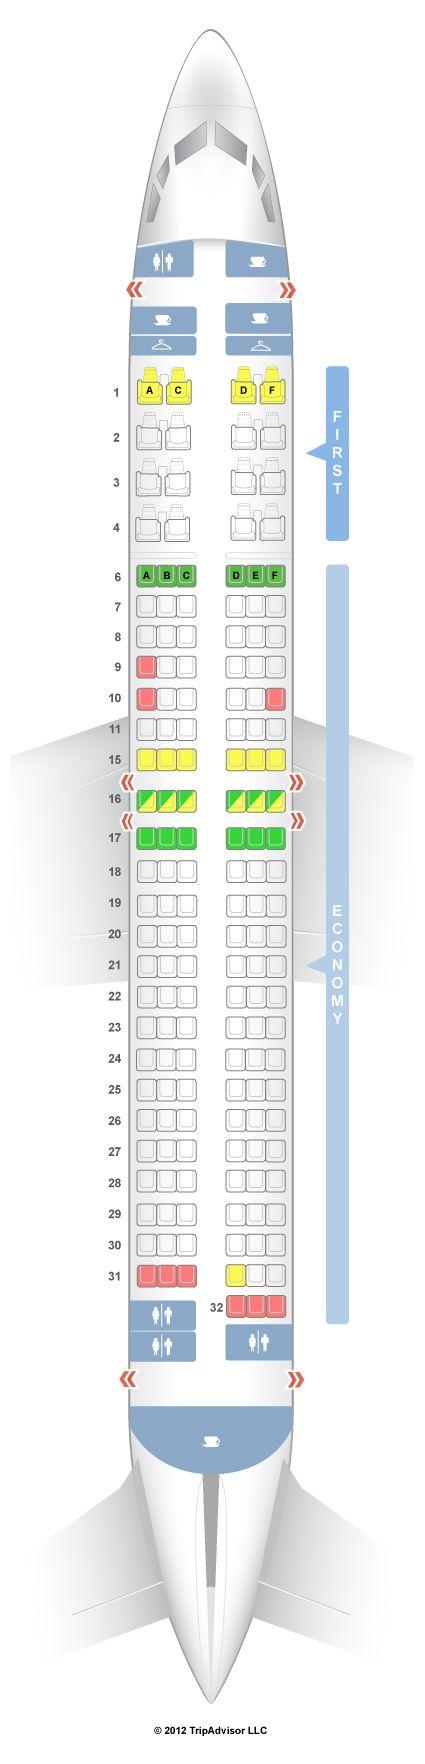 SeatGuru Seat Map Alaska Airlines Boeing 737-800 (738) V1